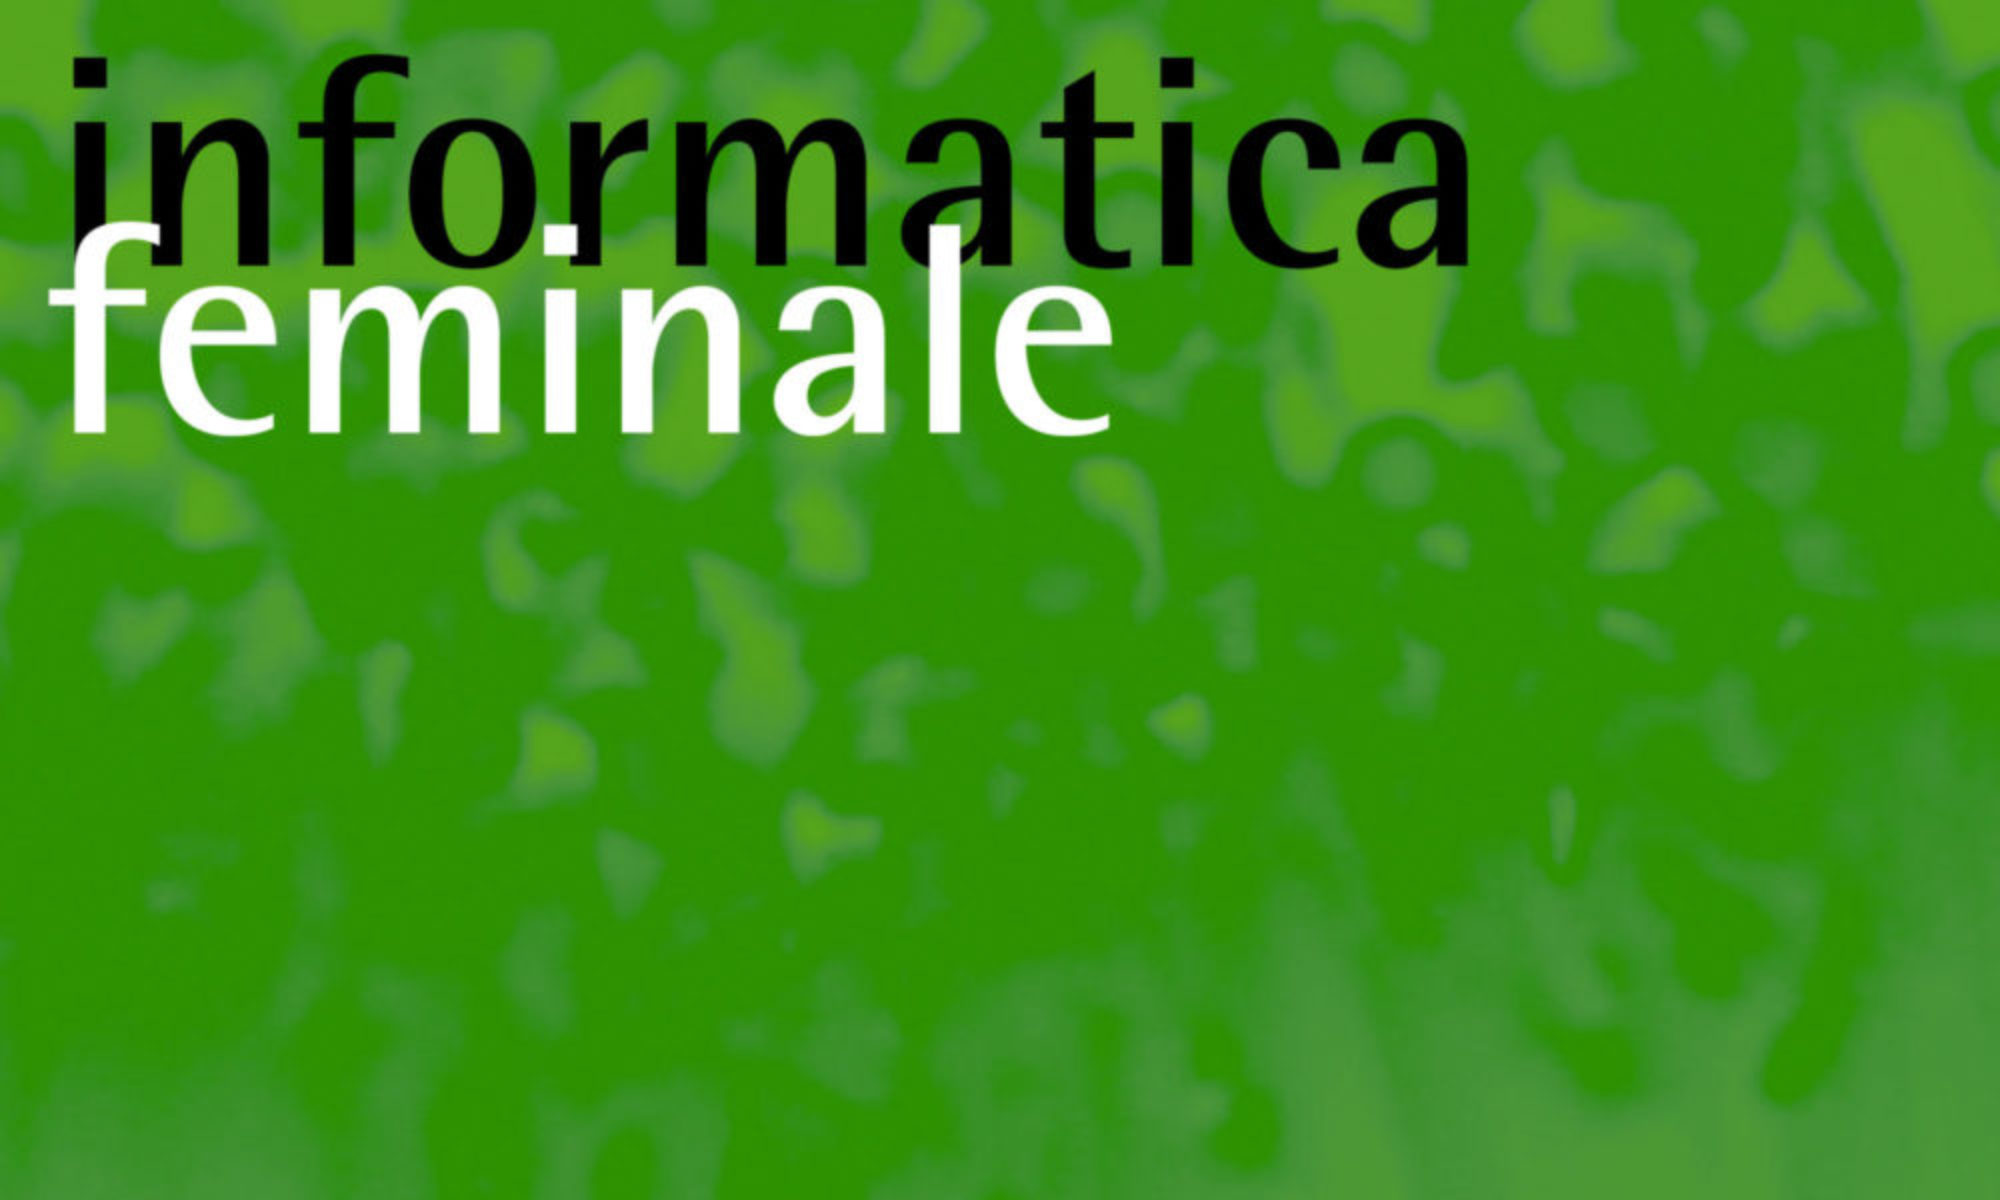 23. Informatica Feminale